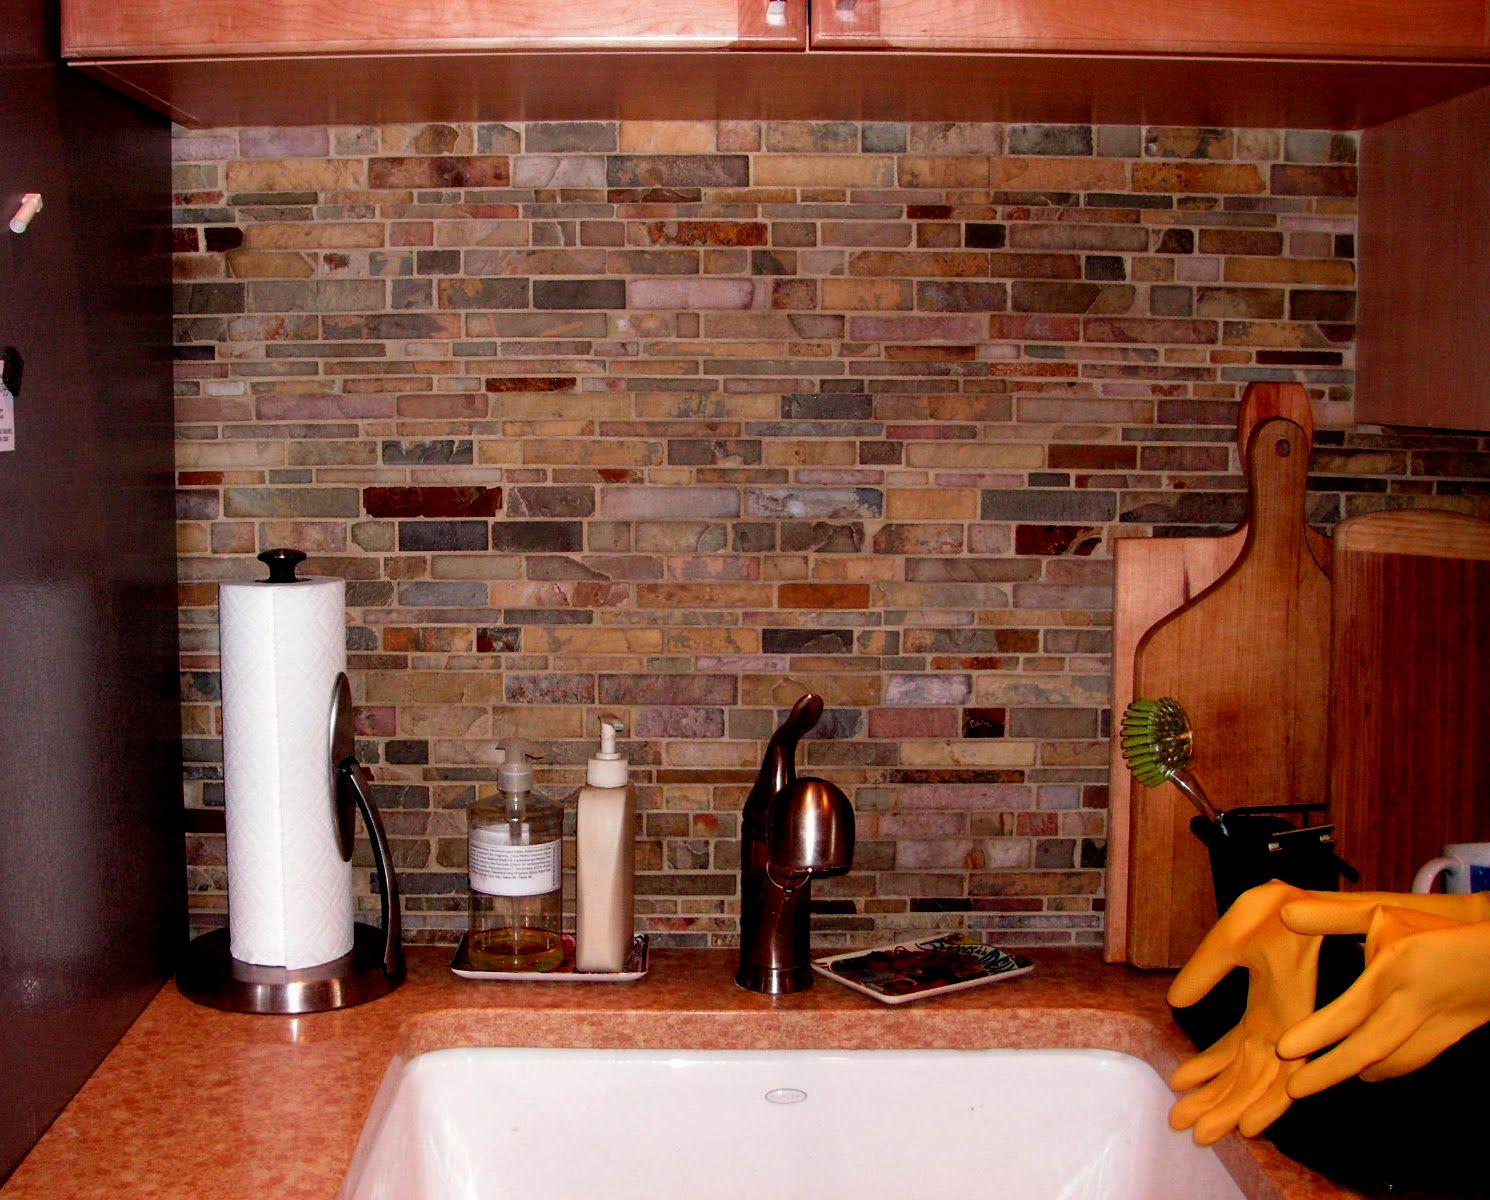 awesome installing bathroom tile wallpaper-Wonderful Installing Bathroom Tile Ideas